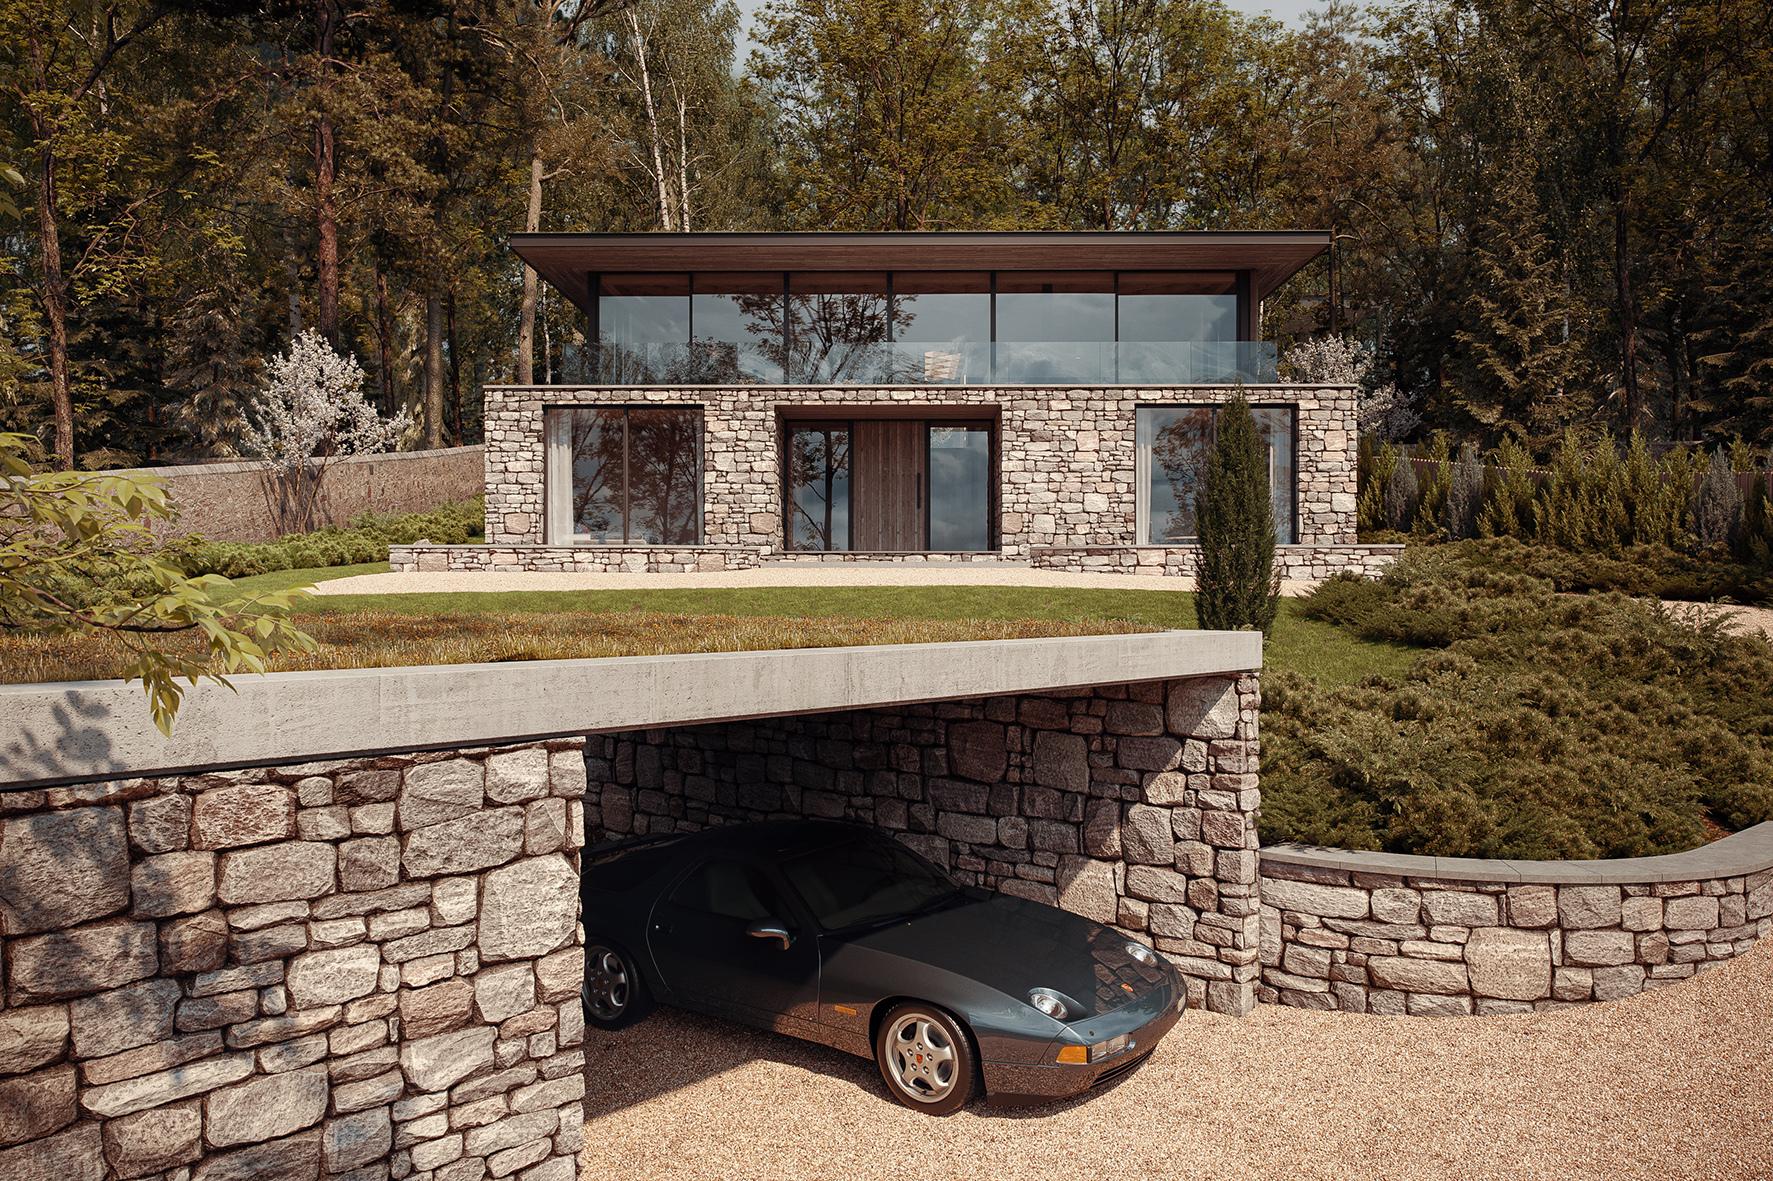 Lynwood-External-Brown-and-Brown-architects-web-007_2021-06-03-143037_mdhq.jpg